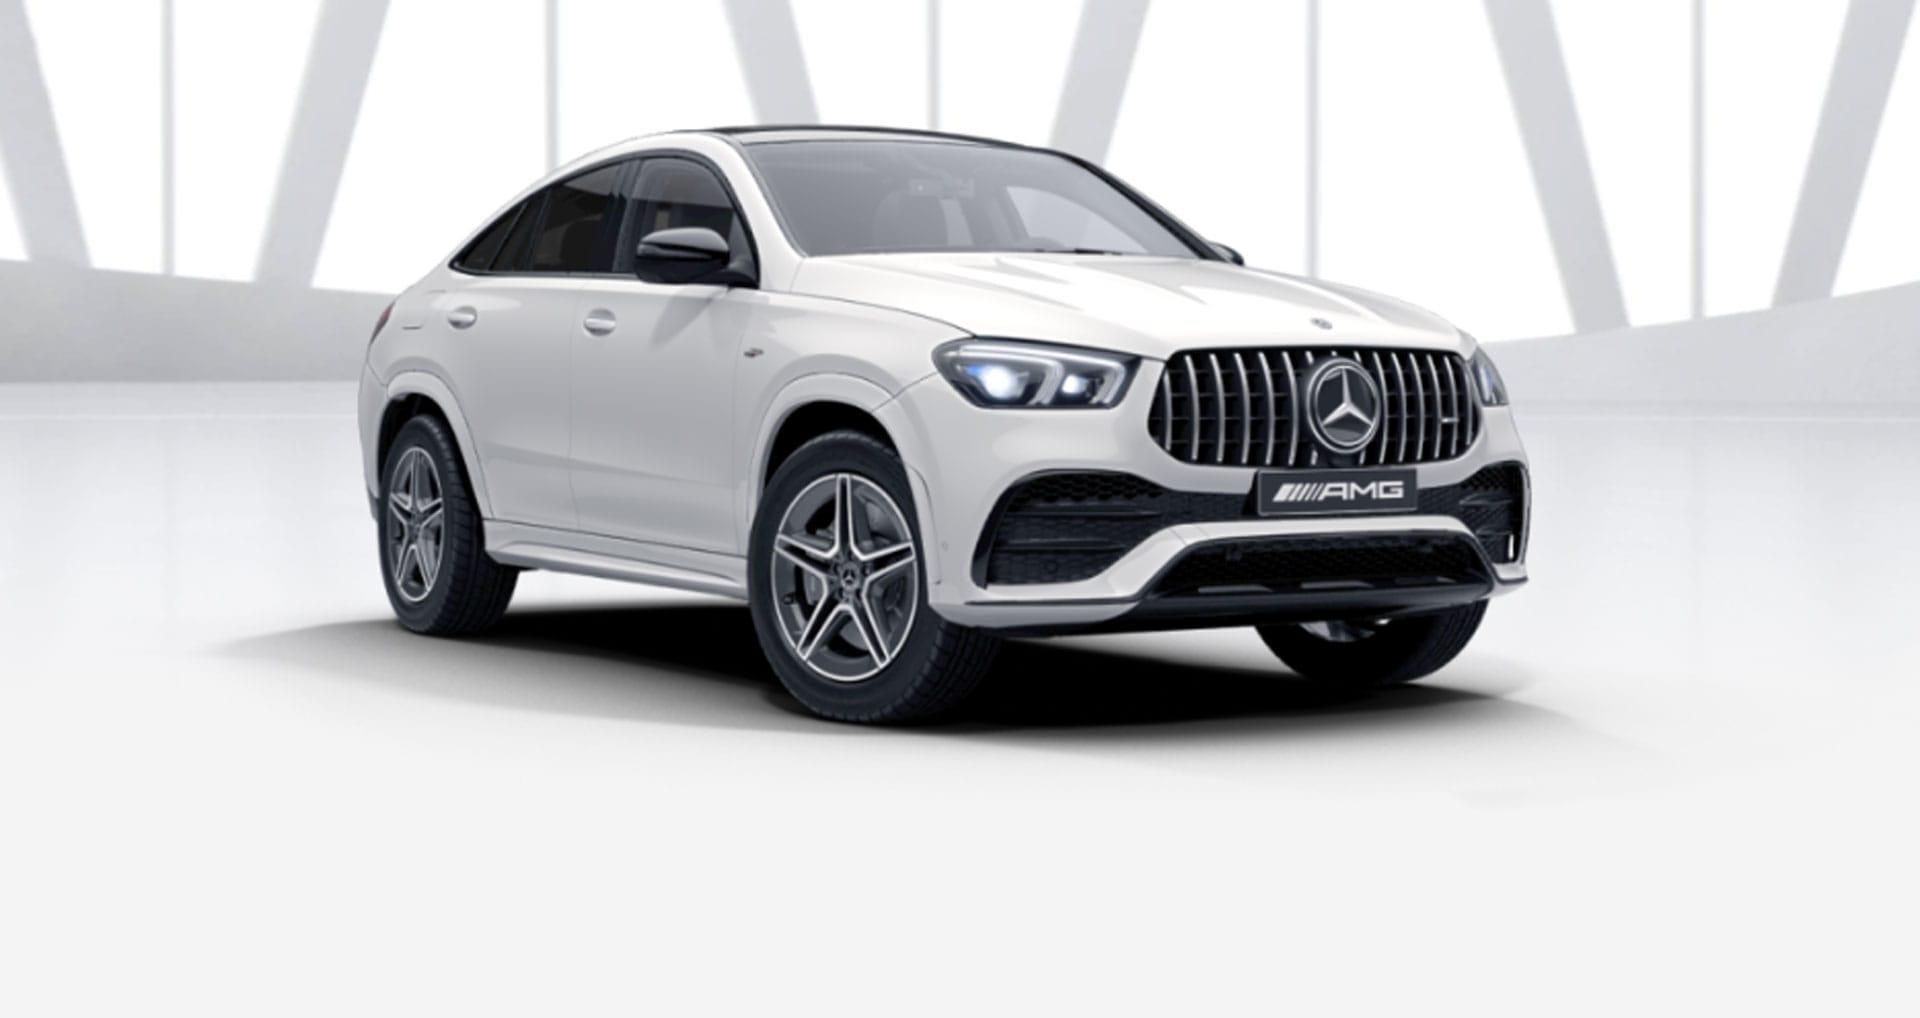 Mercedes-AMG GLE Coupe 0152600459